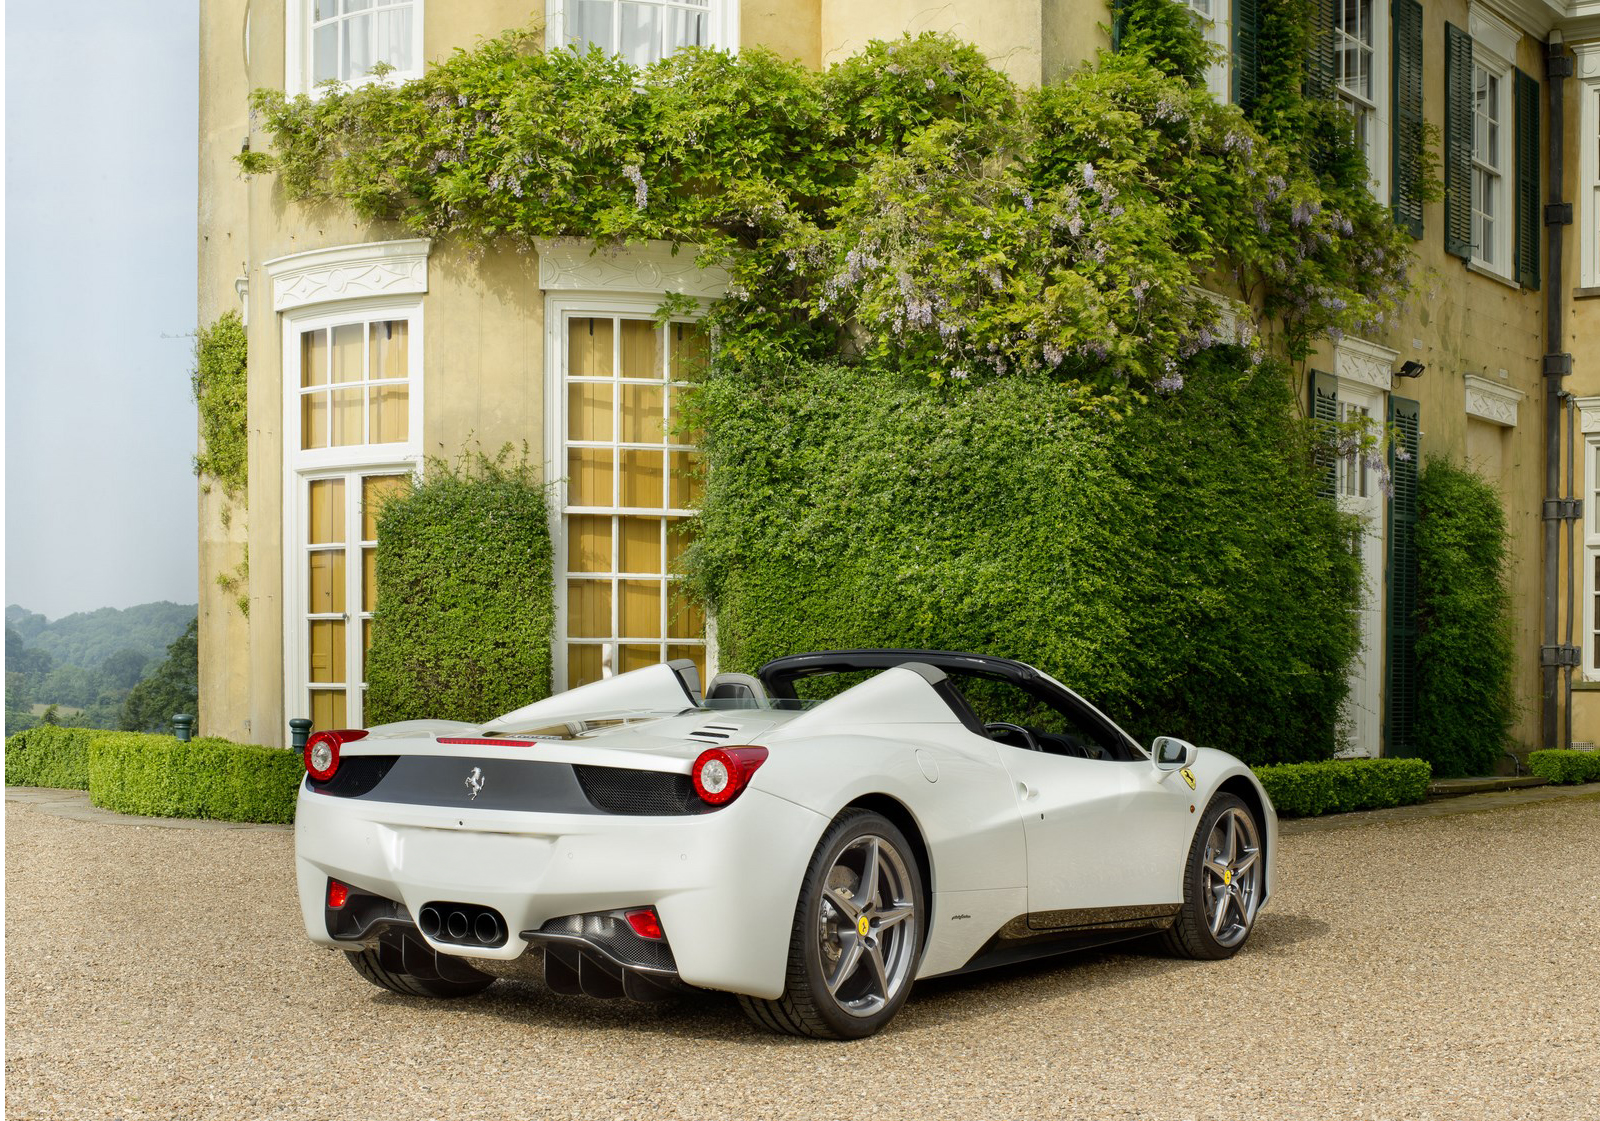 Exotic Car Rental Miami | Mph Club   WordPress.com